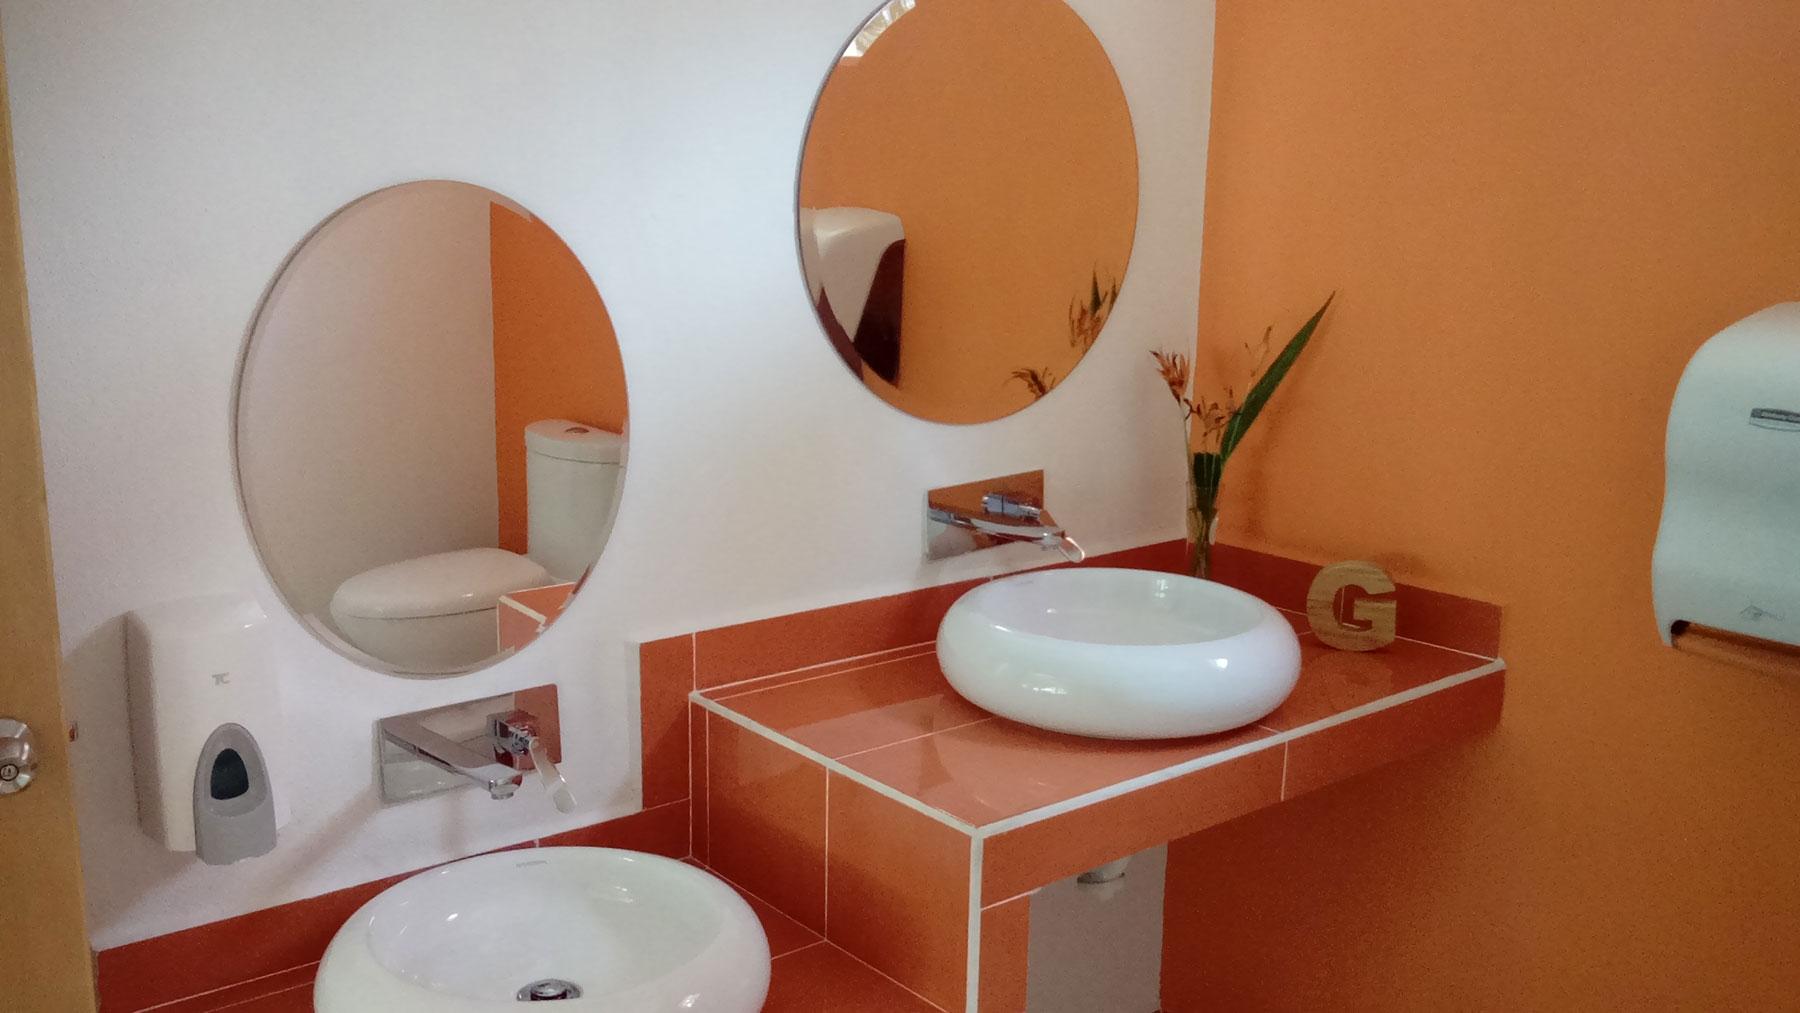 Proyectos SPAD Constructora, Westin Family Kids Club, Baño naranja lavamanos, Diseño de Interiores, Arquitectura, Puerto Vallarta, Jalisco, México